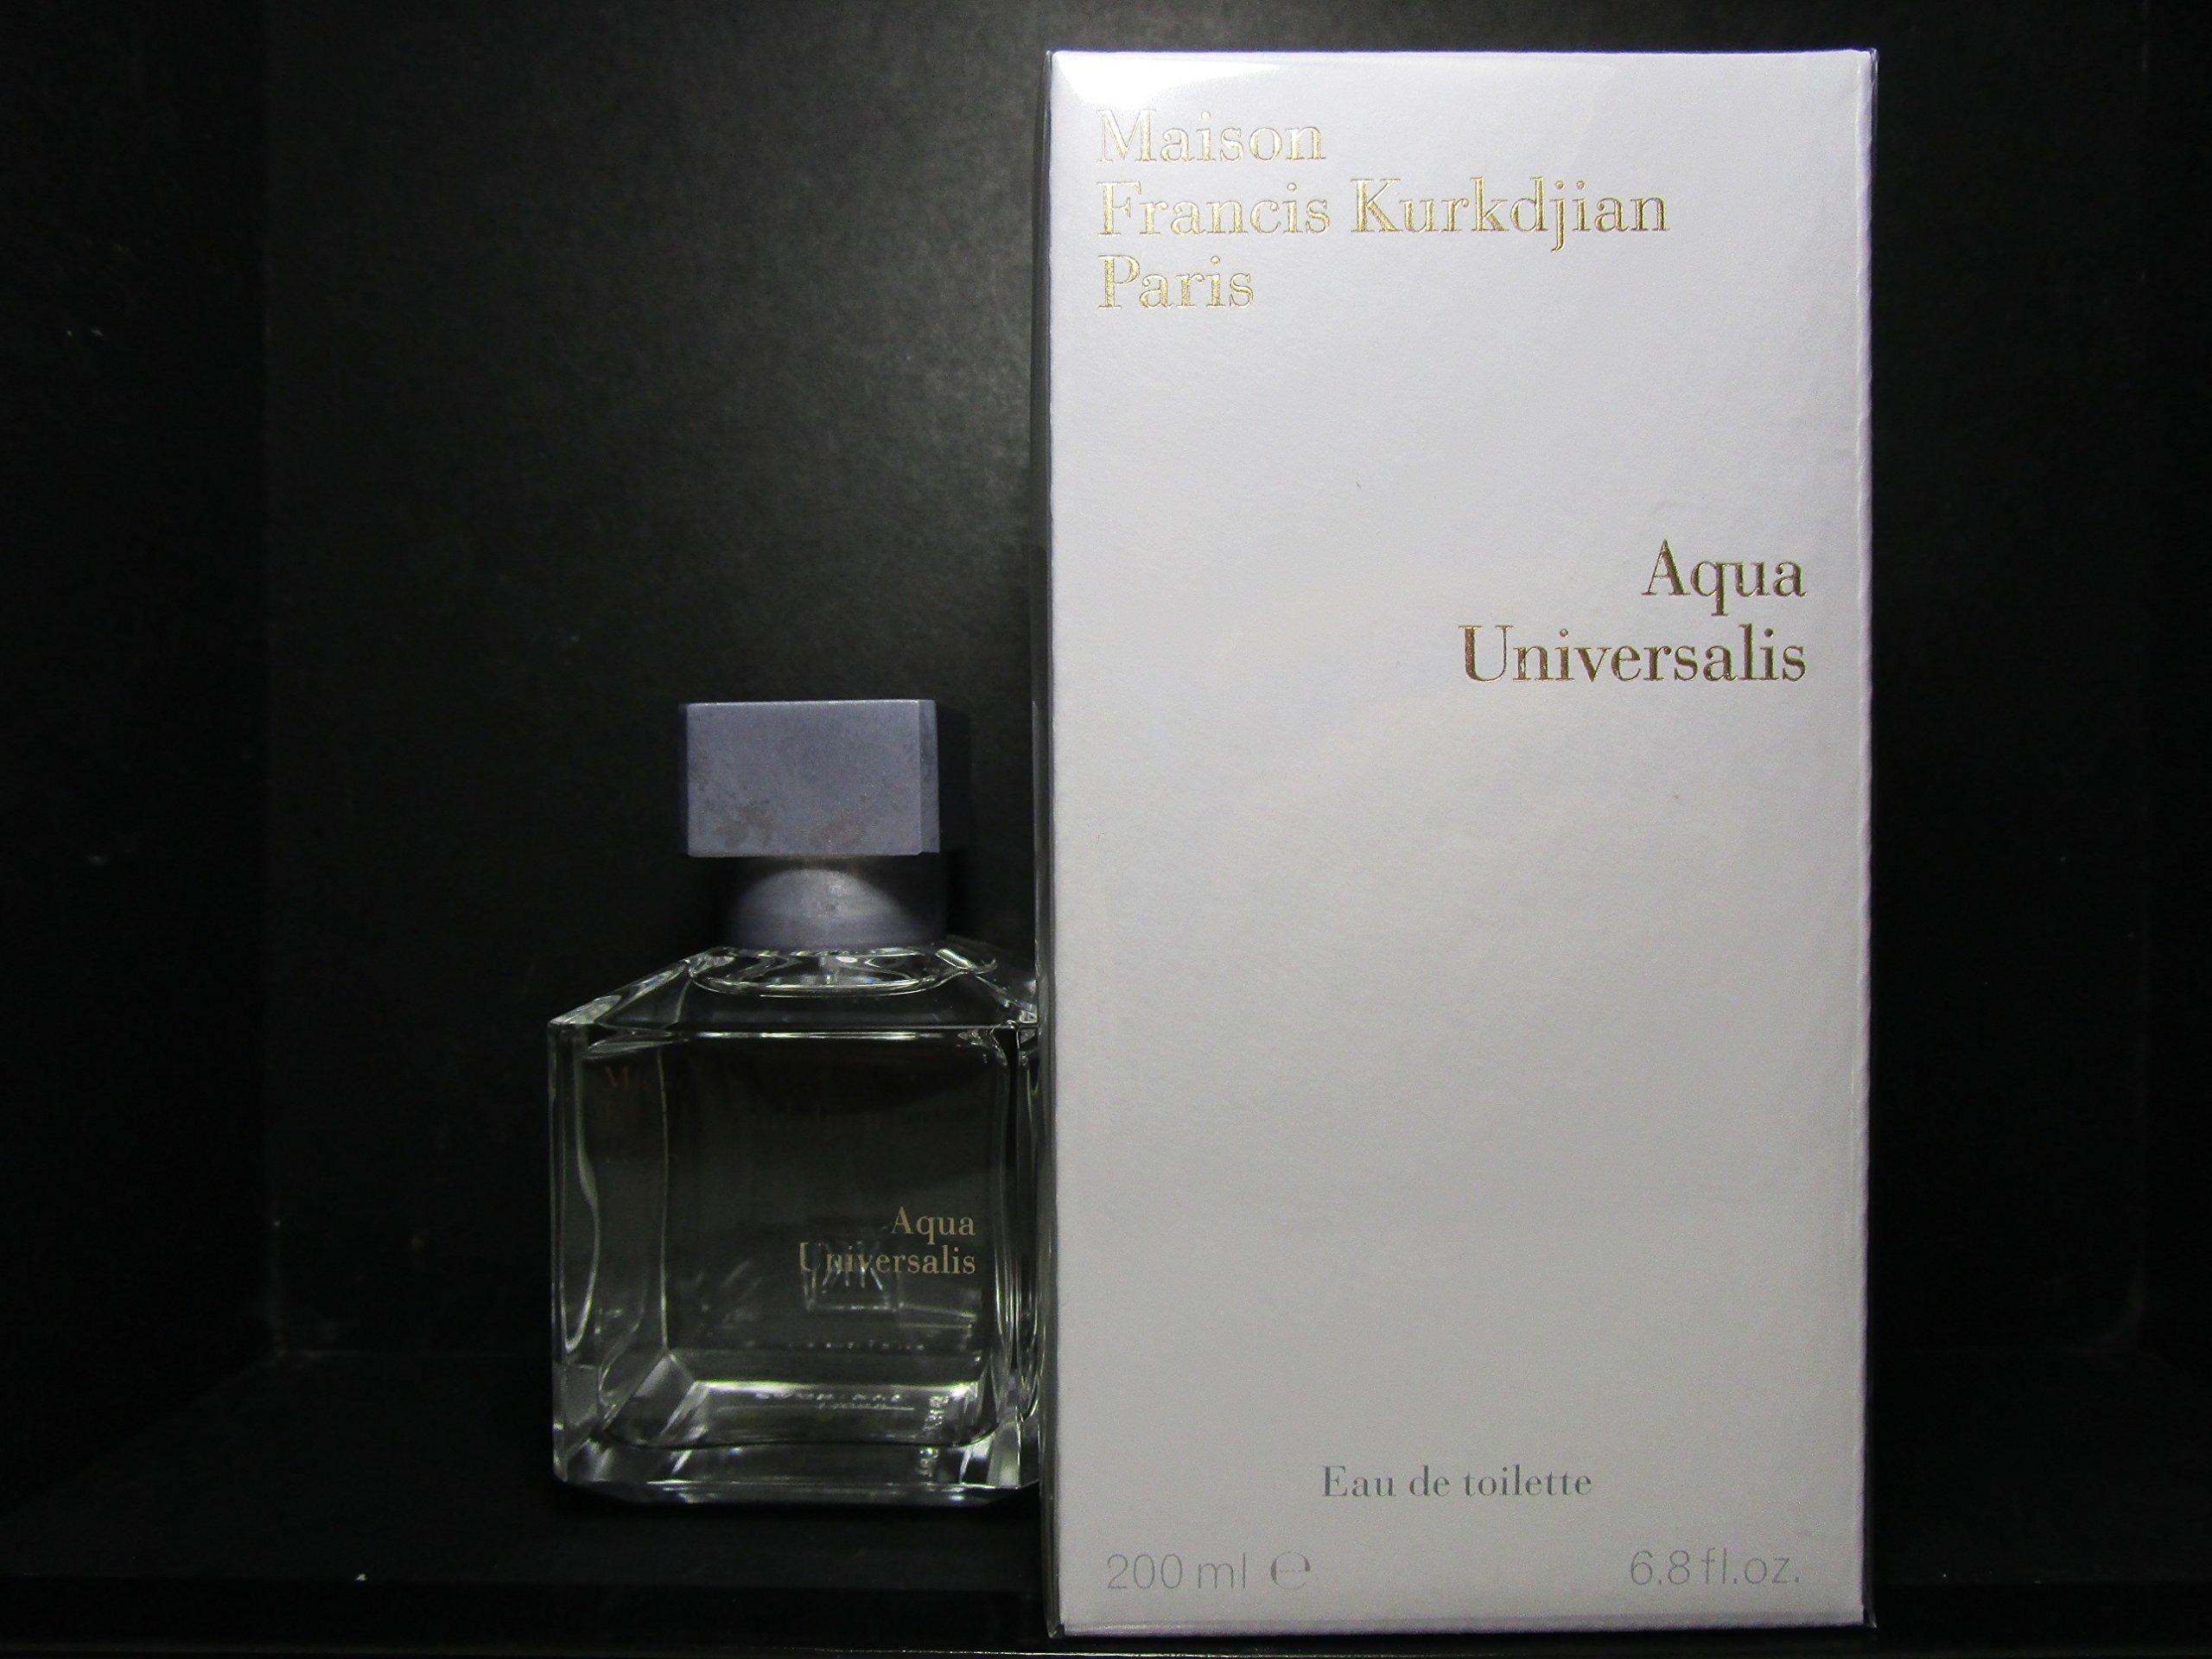 Maison Francis Kurkdjian Aqua Universalis Spray, 6.8 Ounce by Maison Francis Kurkdjian (Image #1)